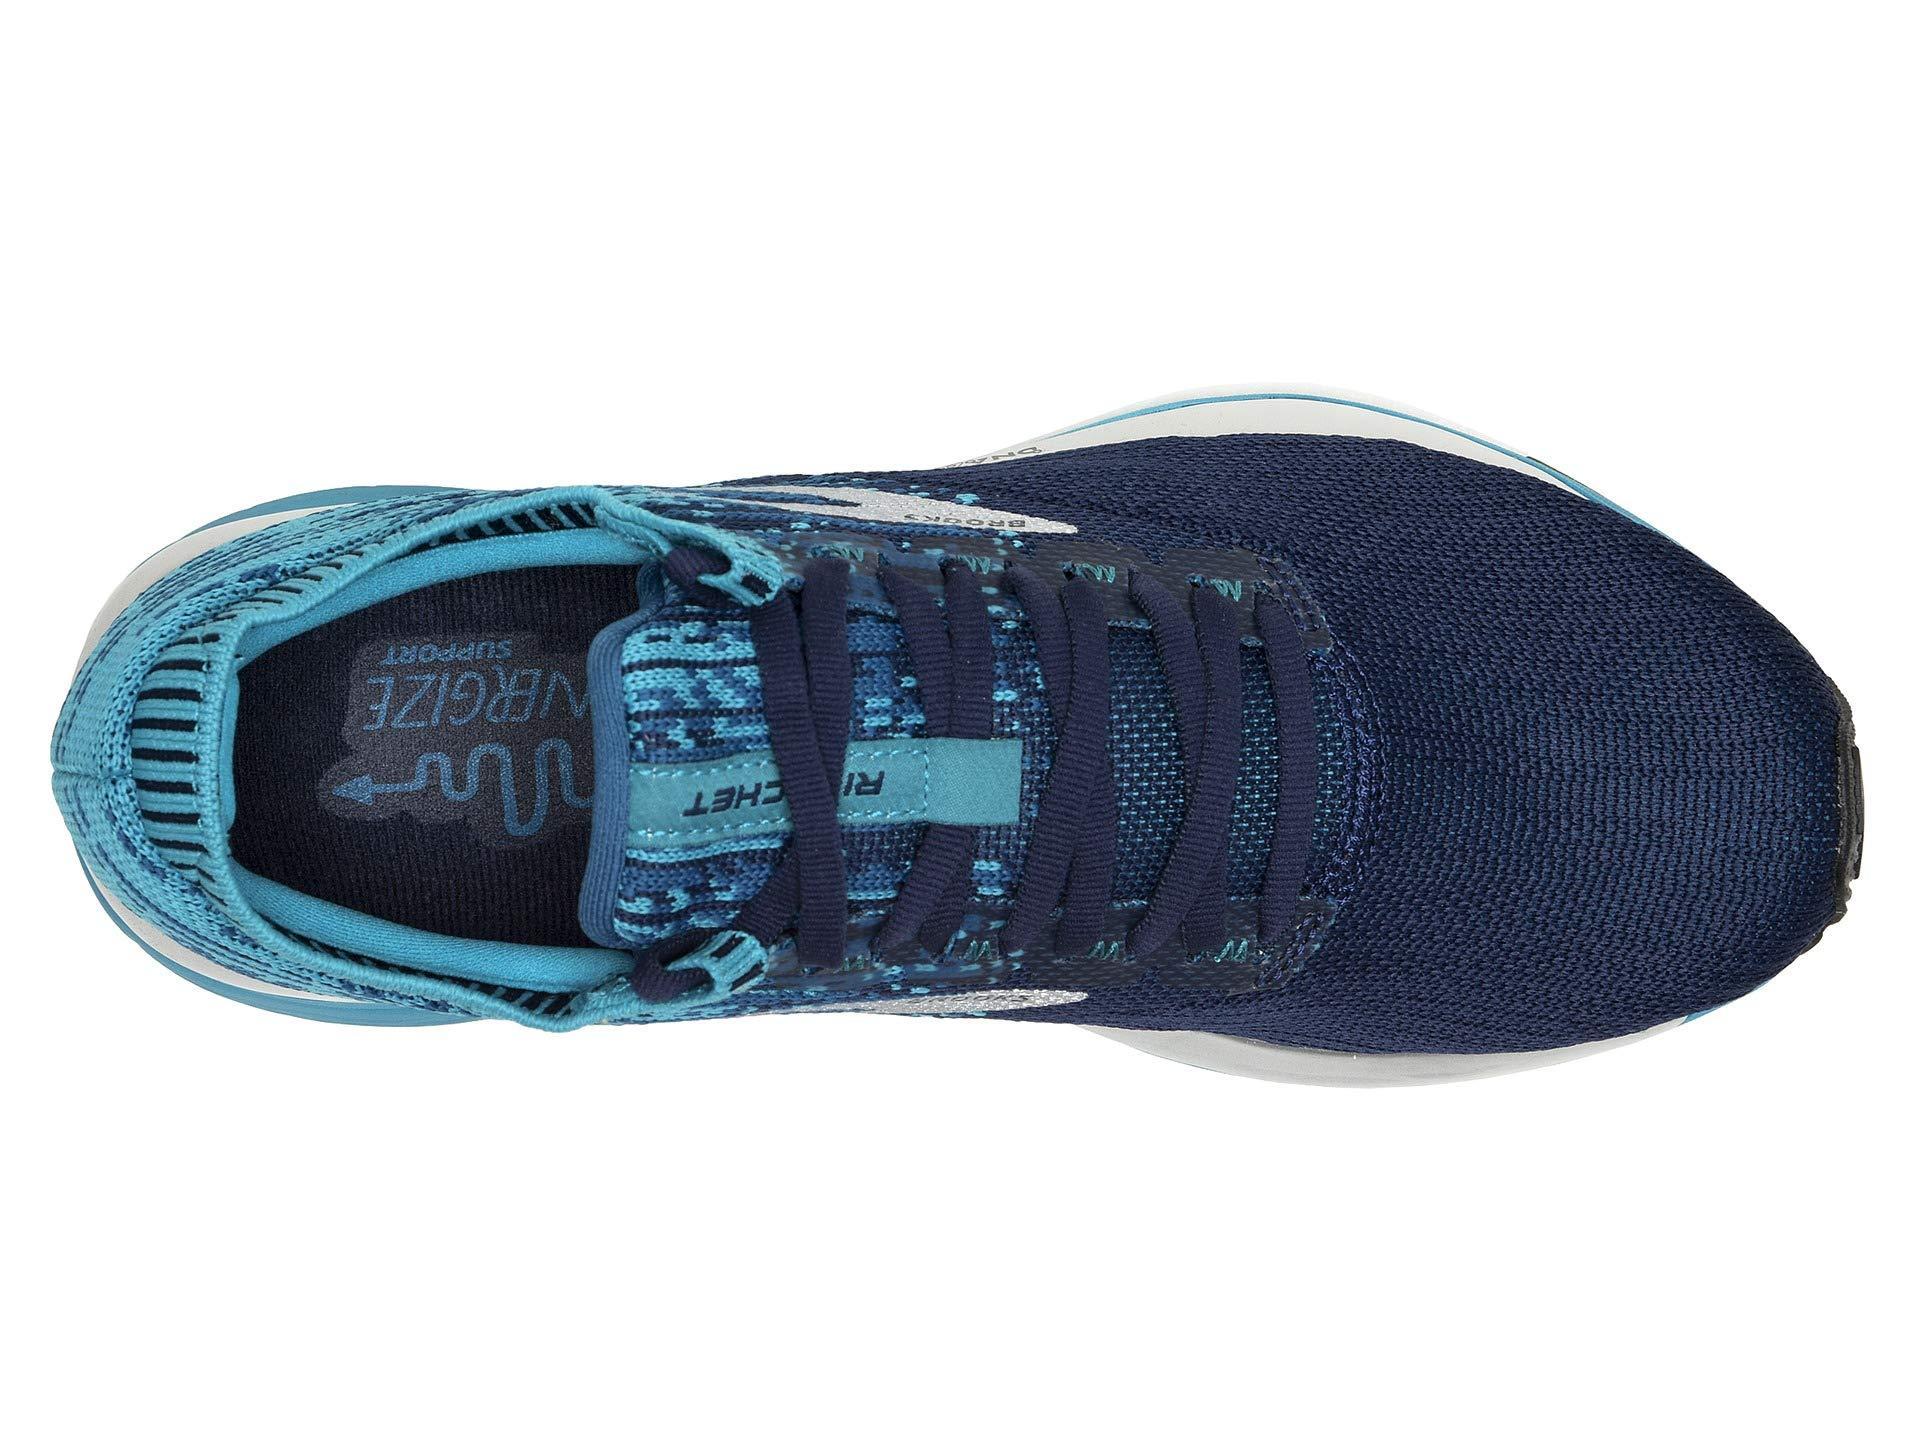 5799fe6f77a Brooks - Blue Ricochet (purple lilac navy) Women s Running Shoes - Lyst.  View fullscreen